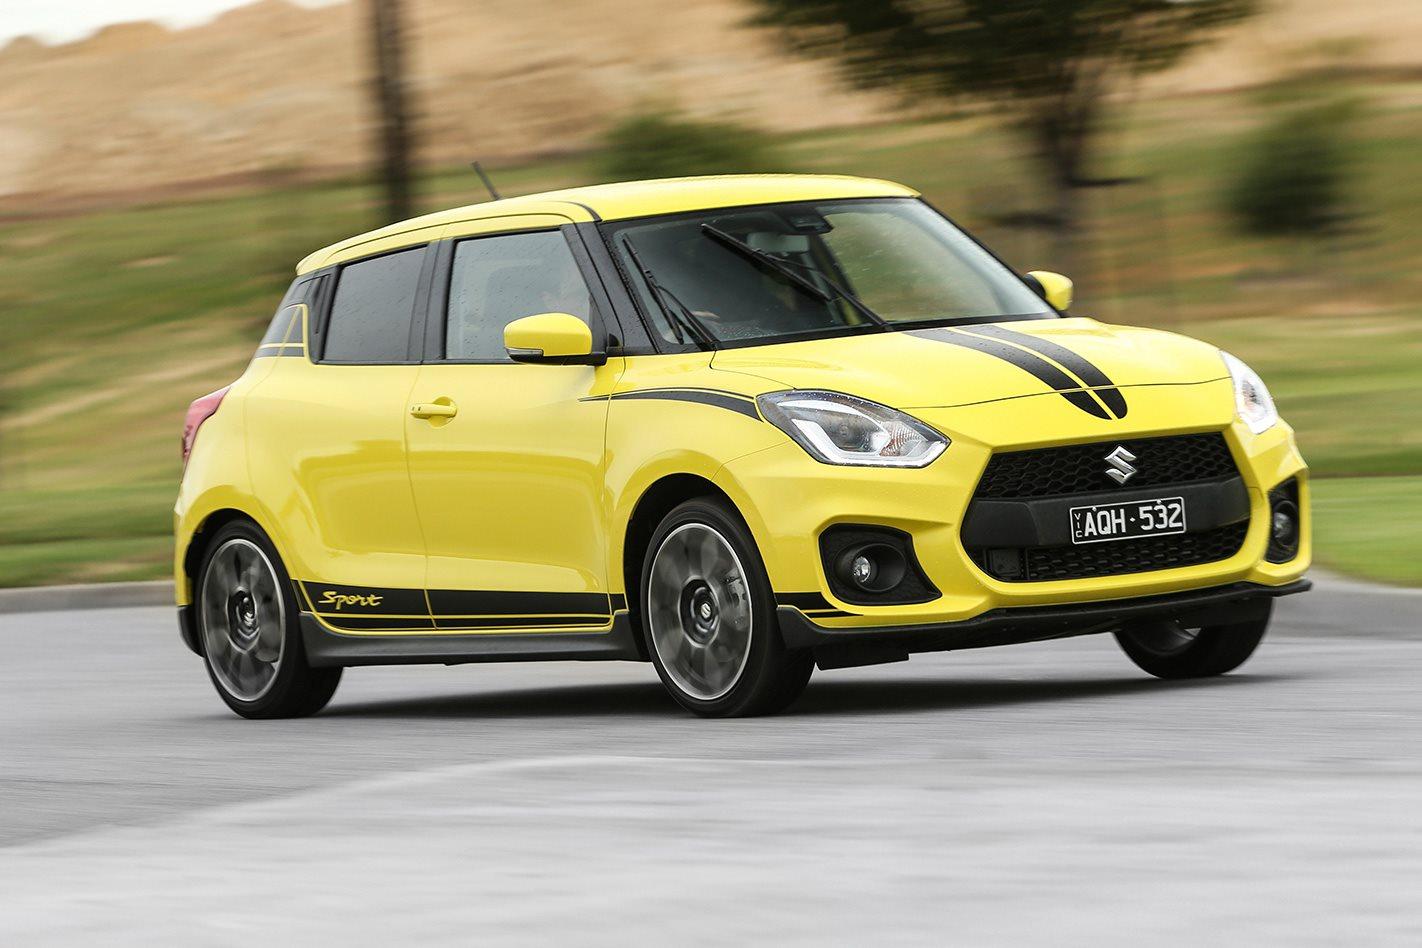 2018 Suzuki Swift Sport long-term review, part three